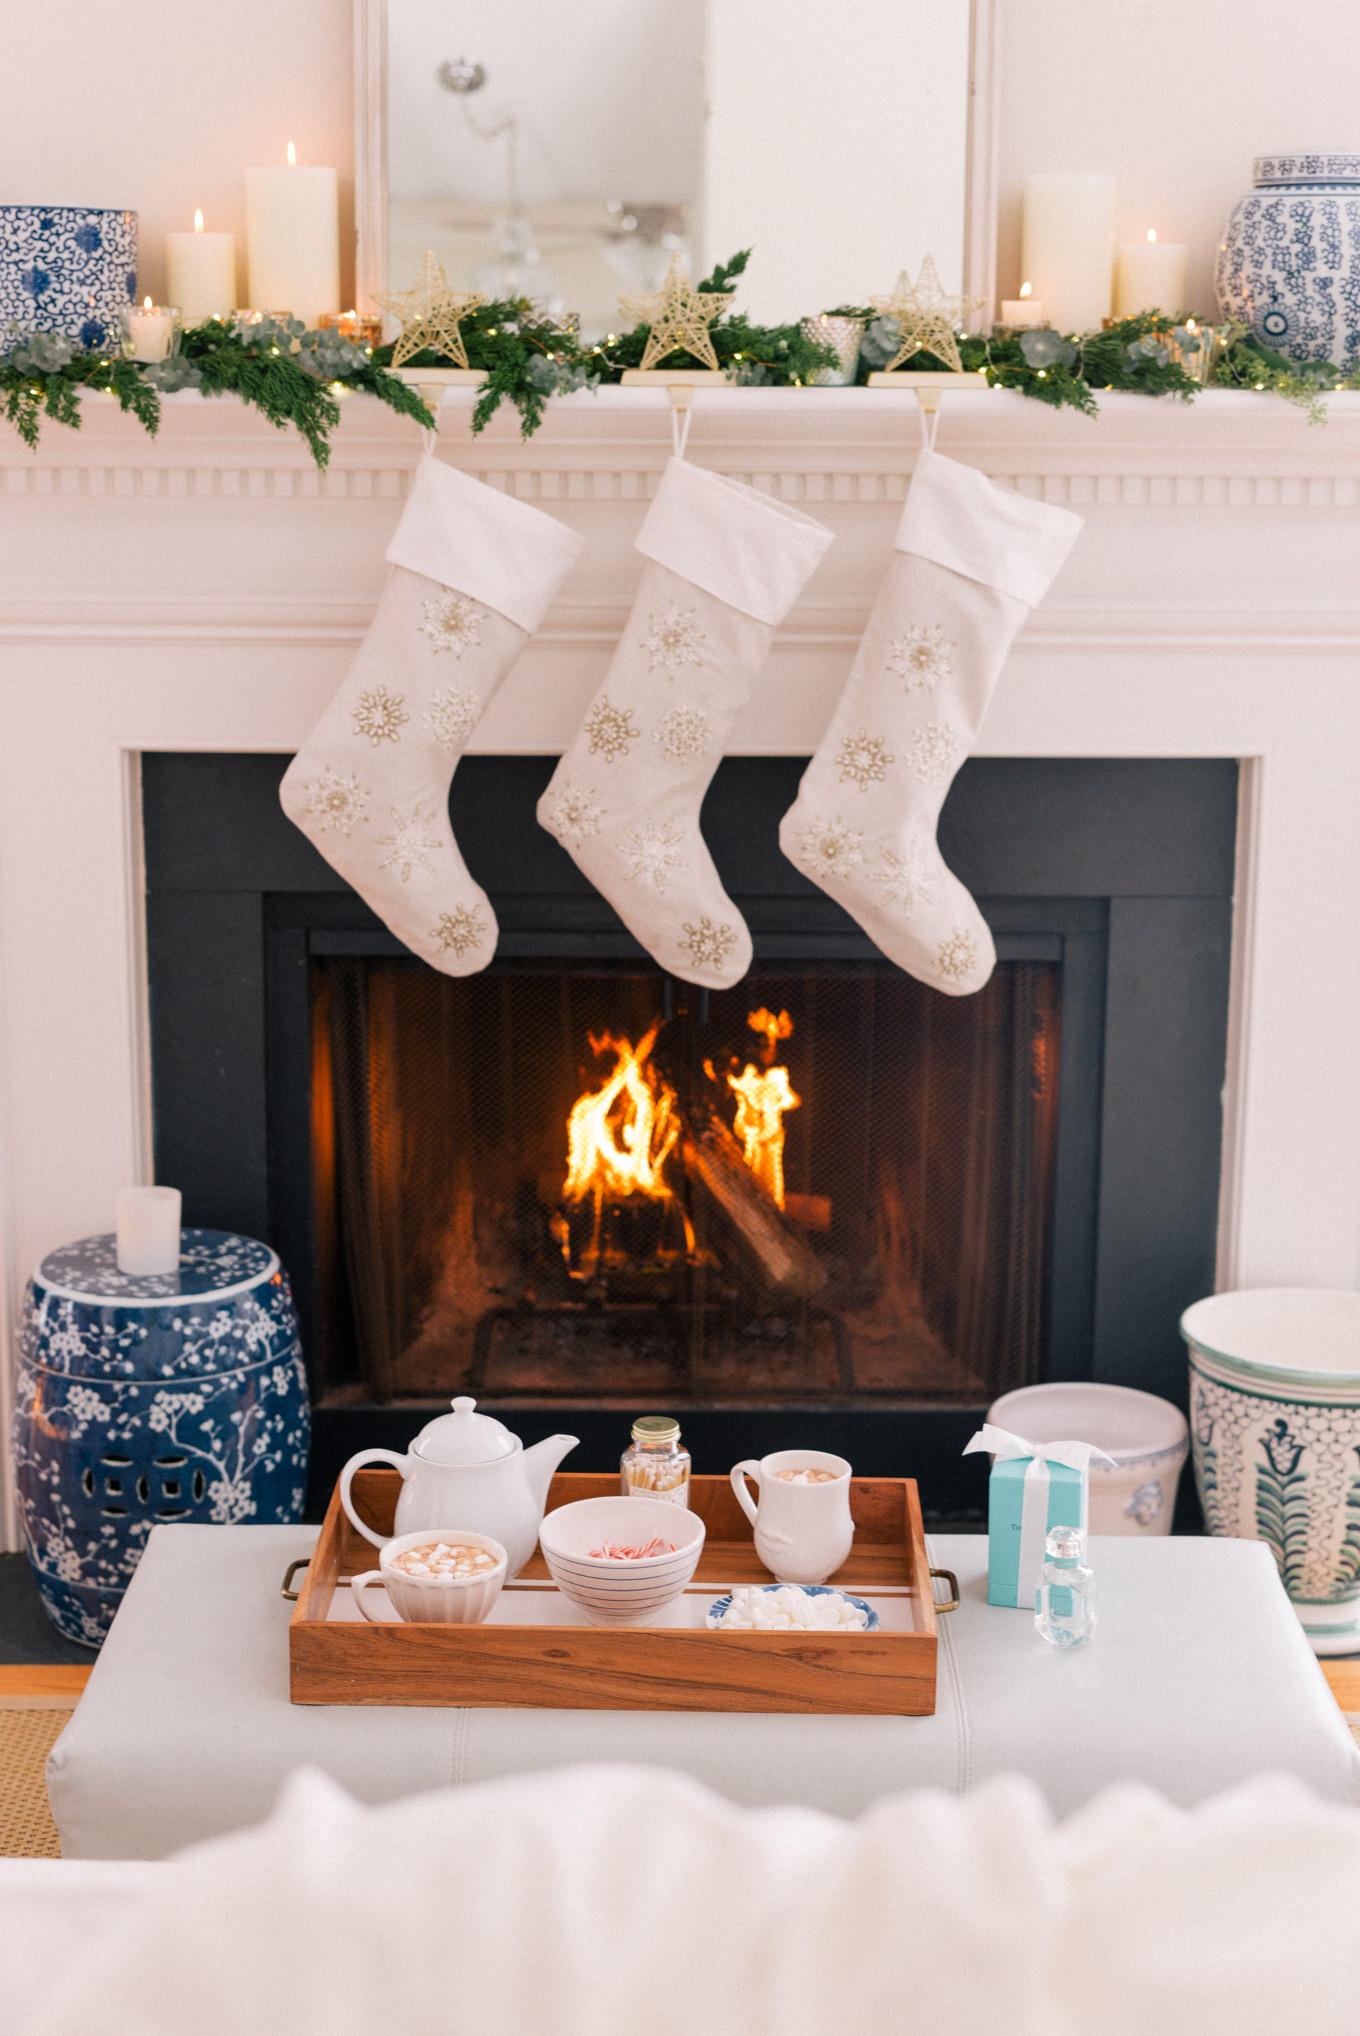 gmg-holiday-stocking-mantle-1007861